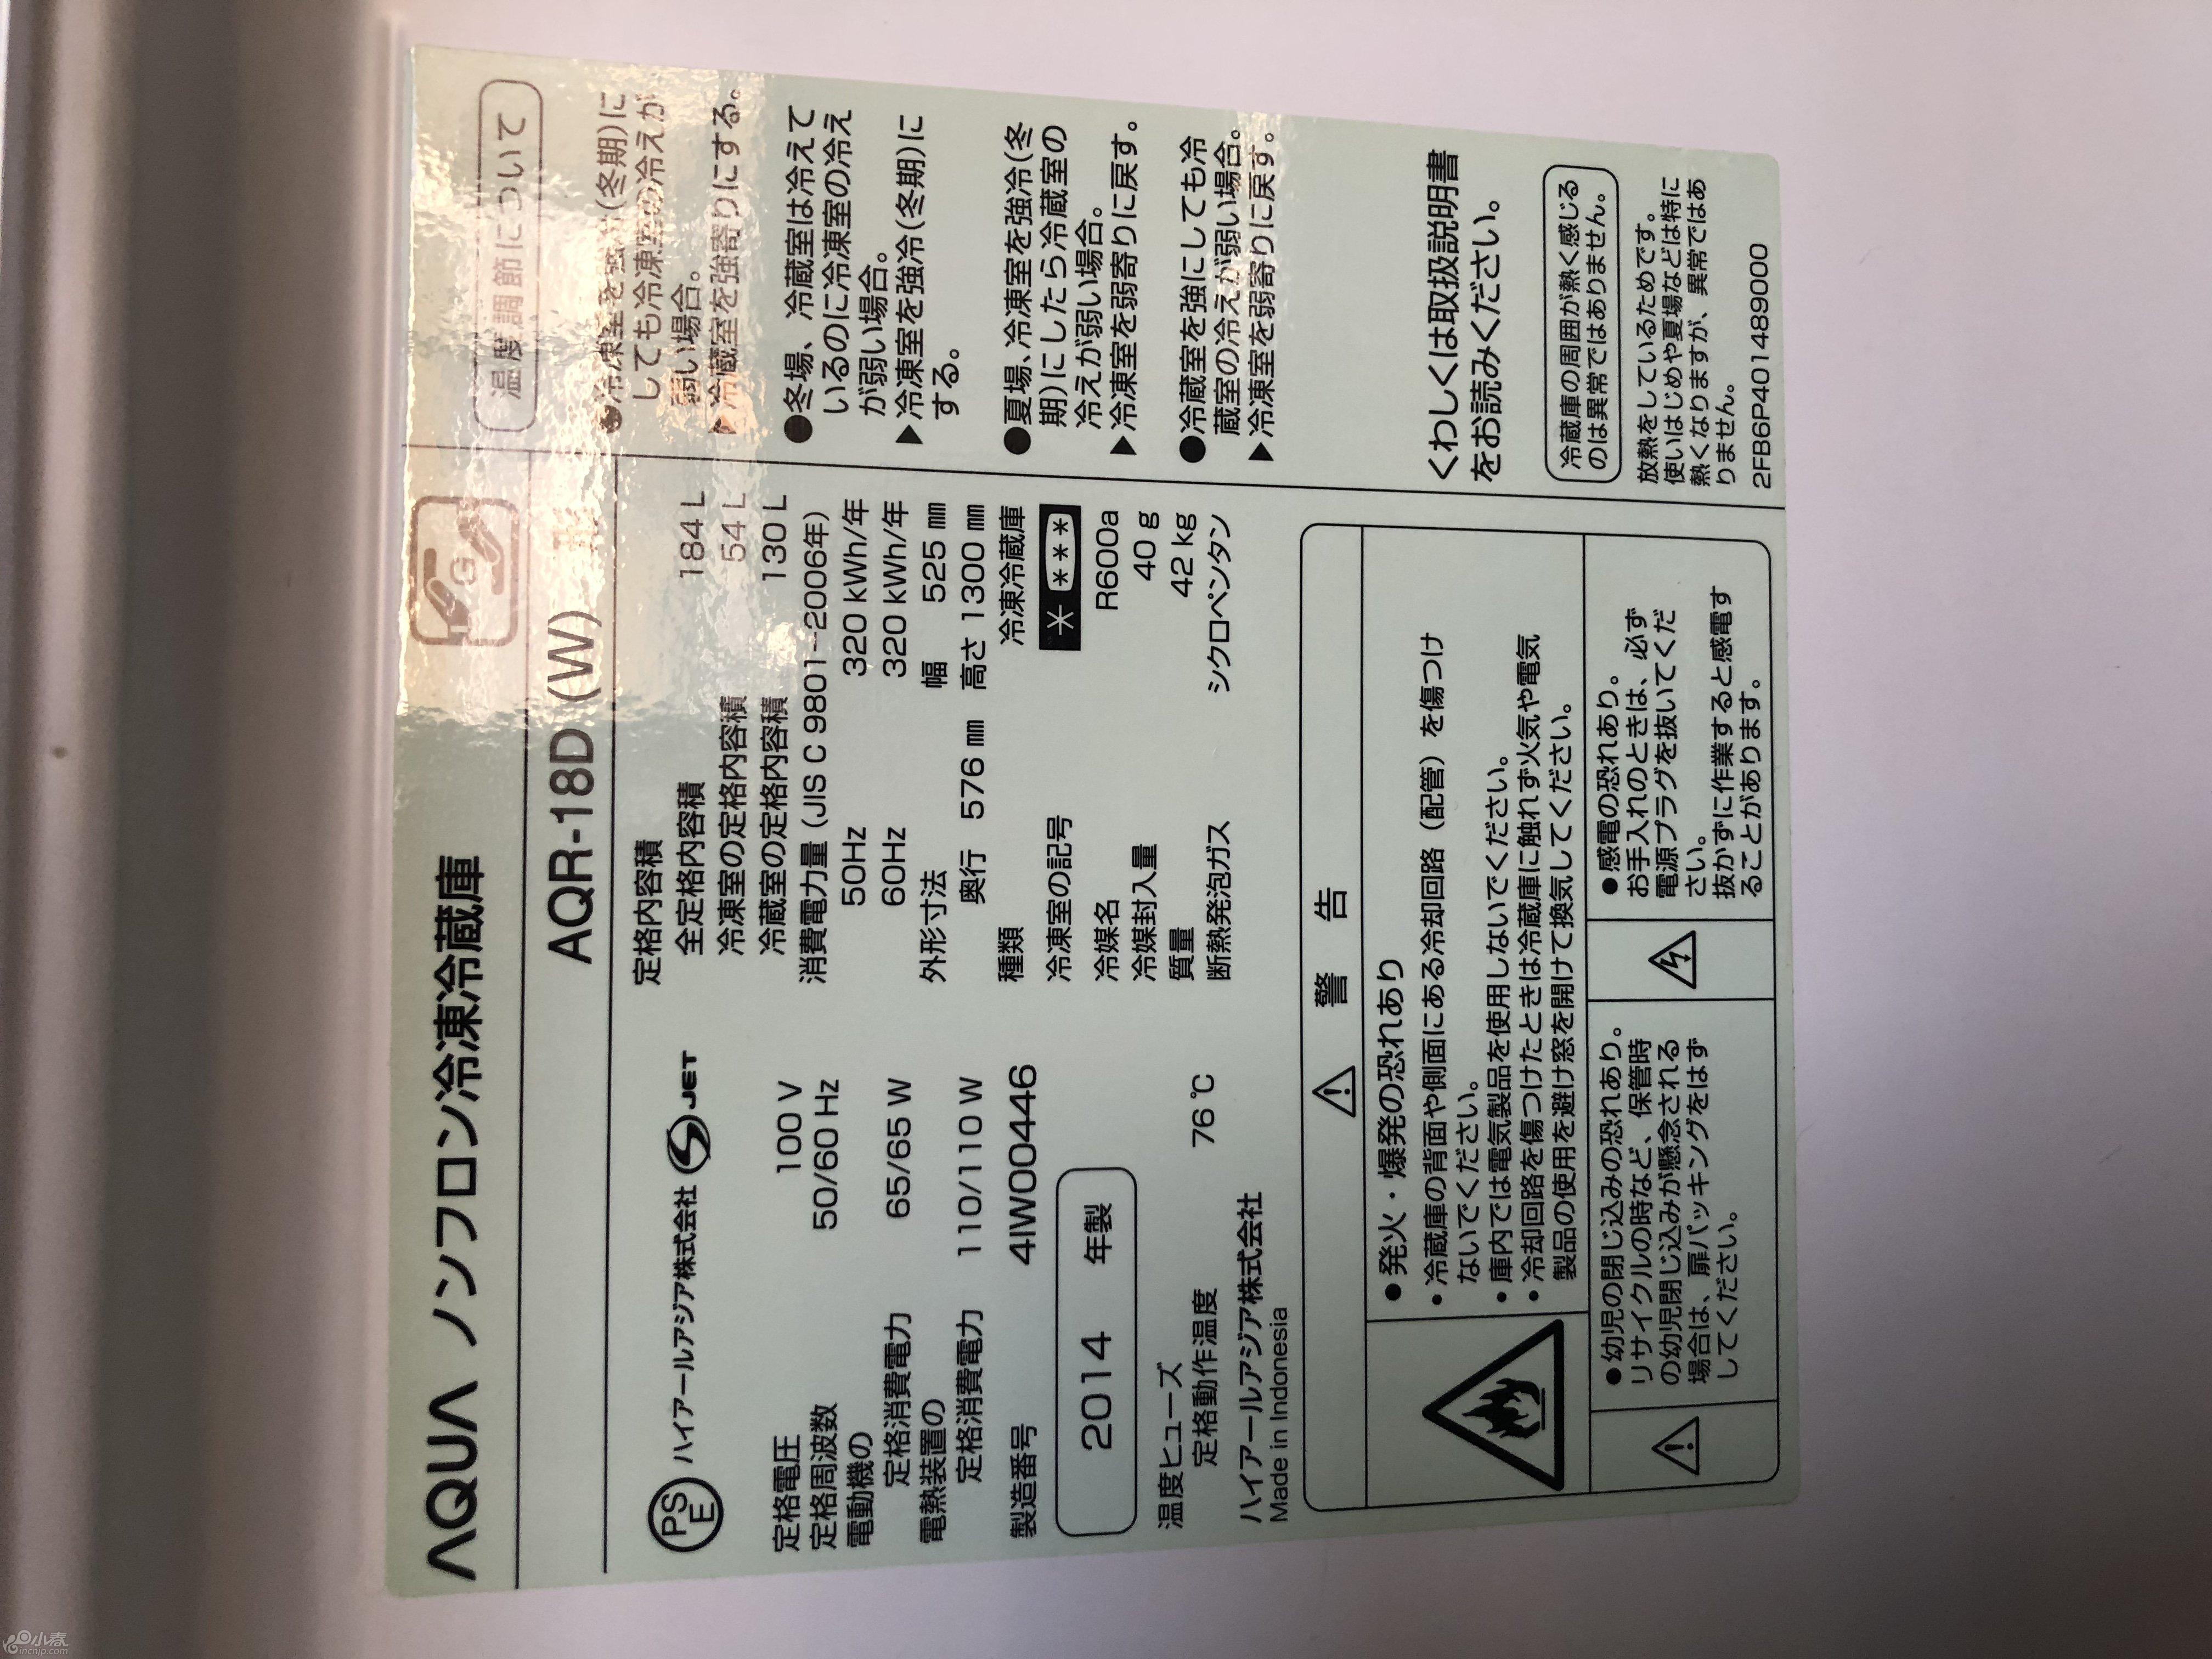 A2E6DF34-BAC4-4ECA-854C-2ADF91CE9E11.jpeg